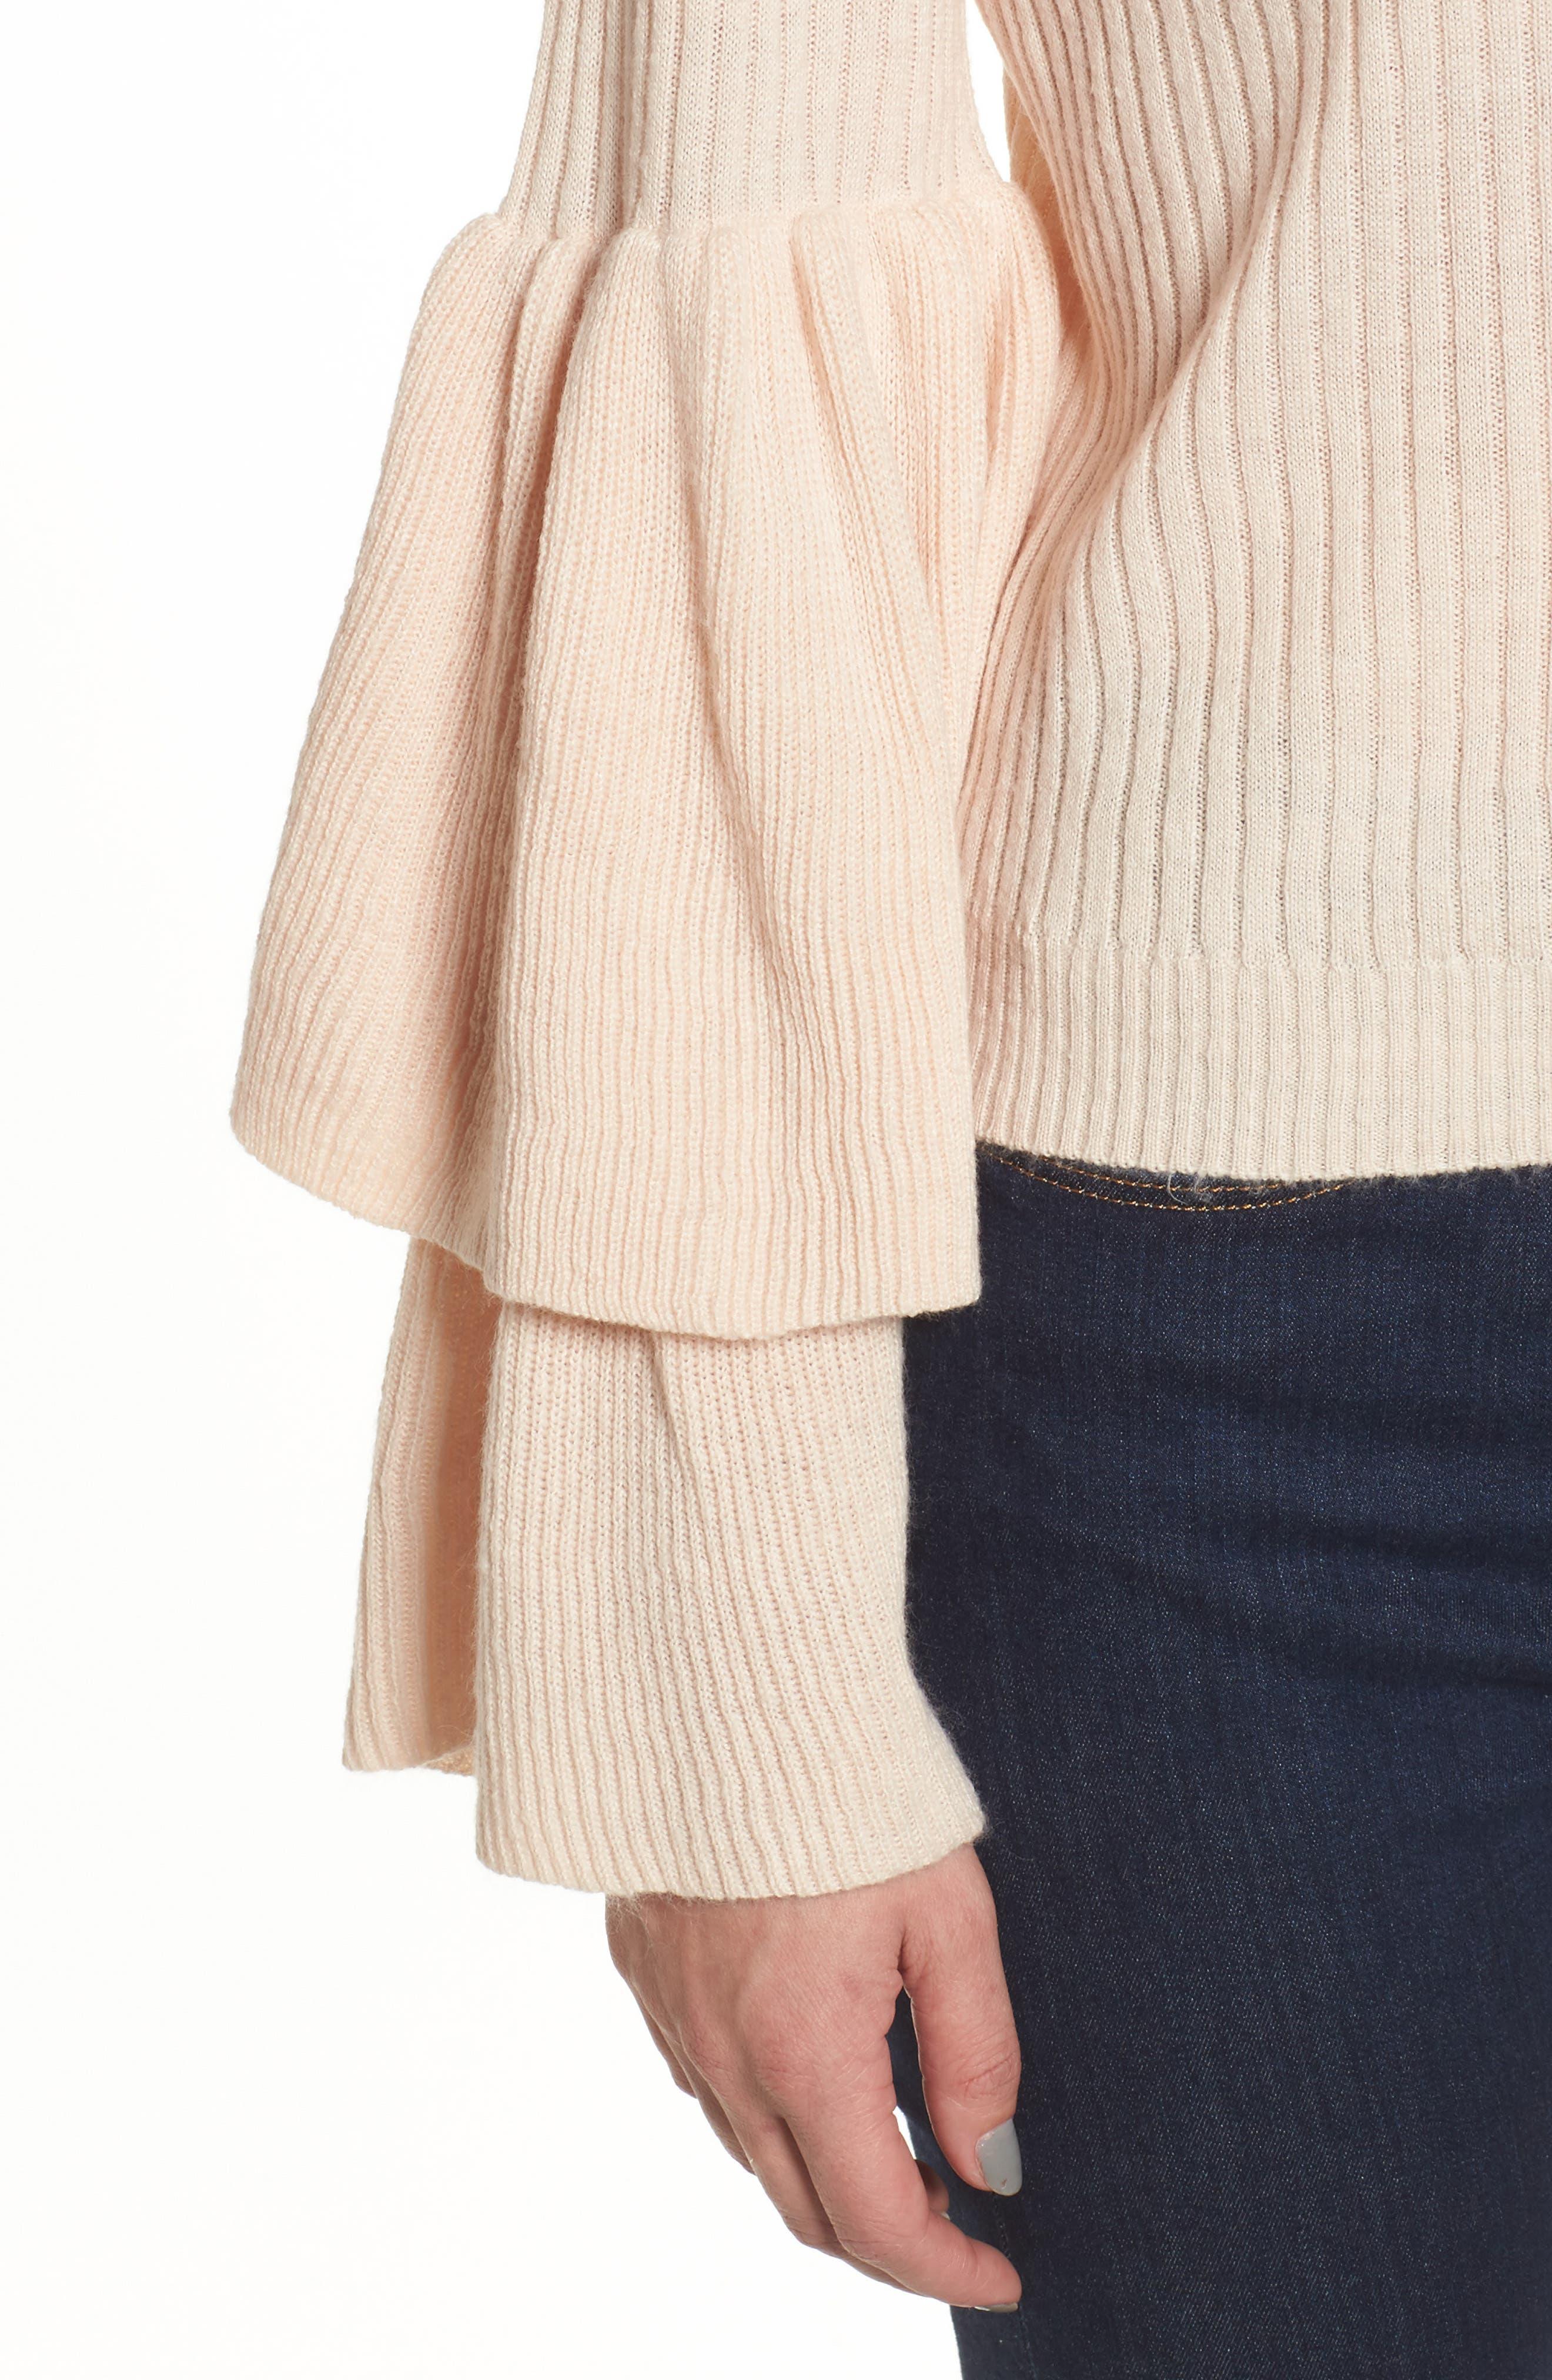 Tiara Bell Sleeve Sweater,                             Alternate thumbnail 4, color,                             Blush